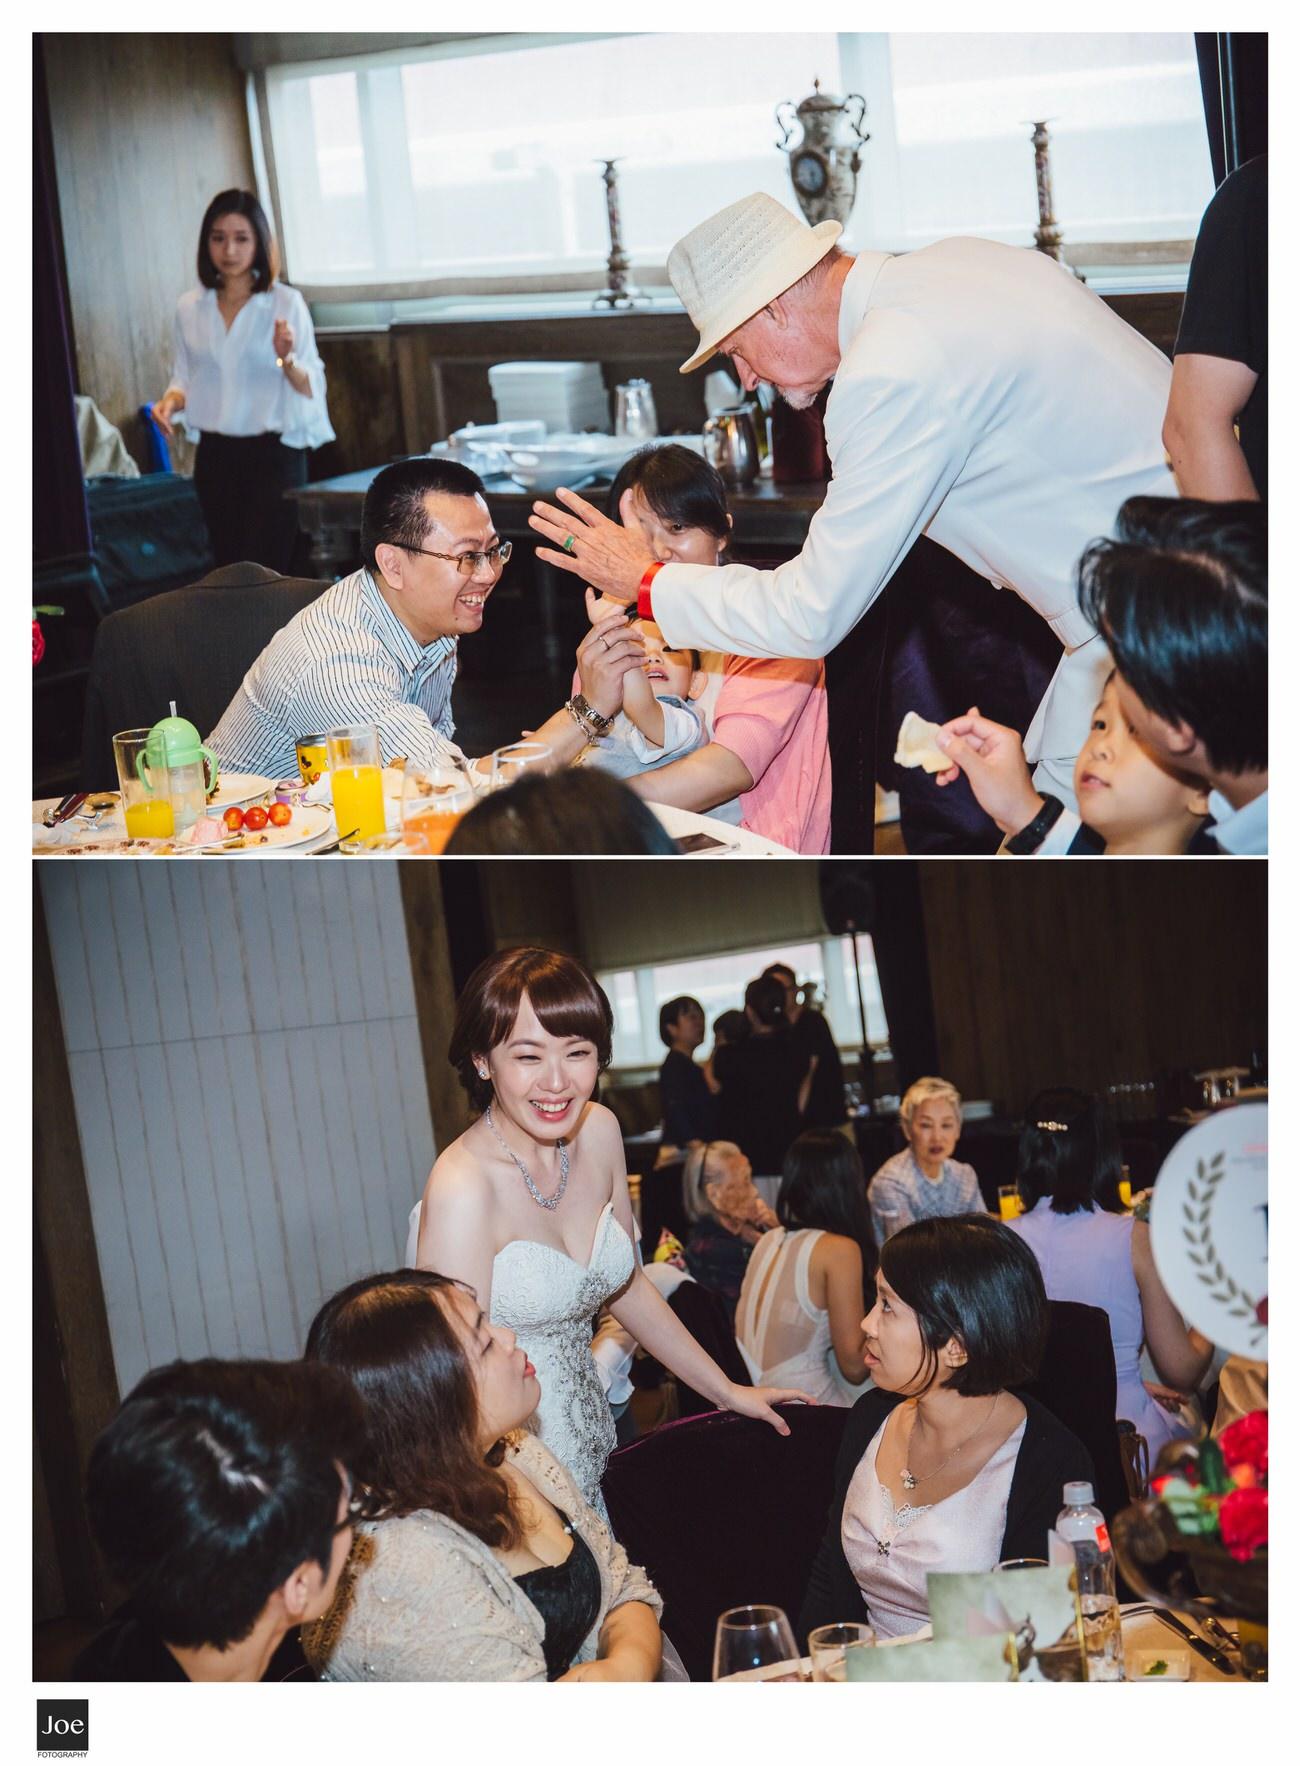 joe-fotography-wedding-photo-palais-de-chine-hotel-039.jpg